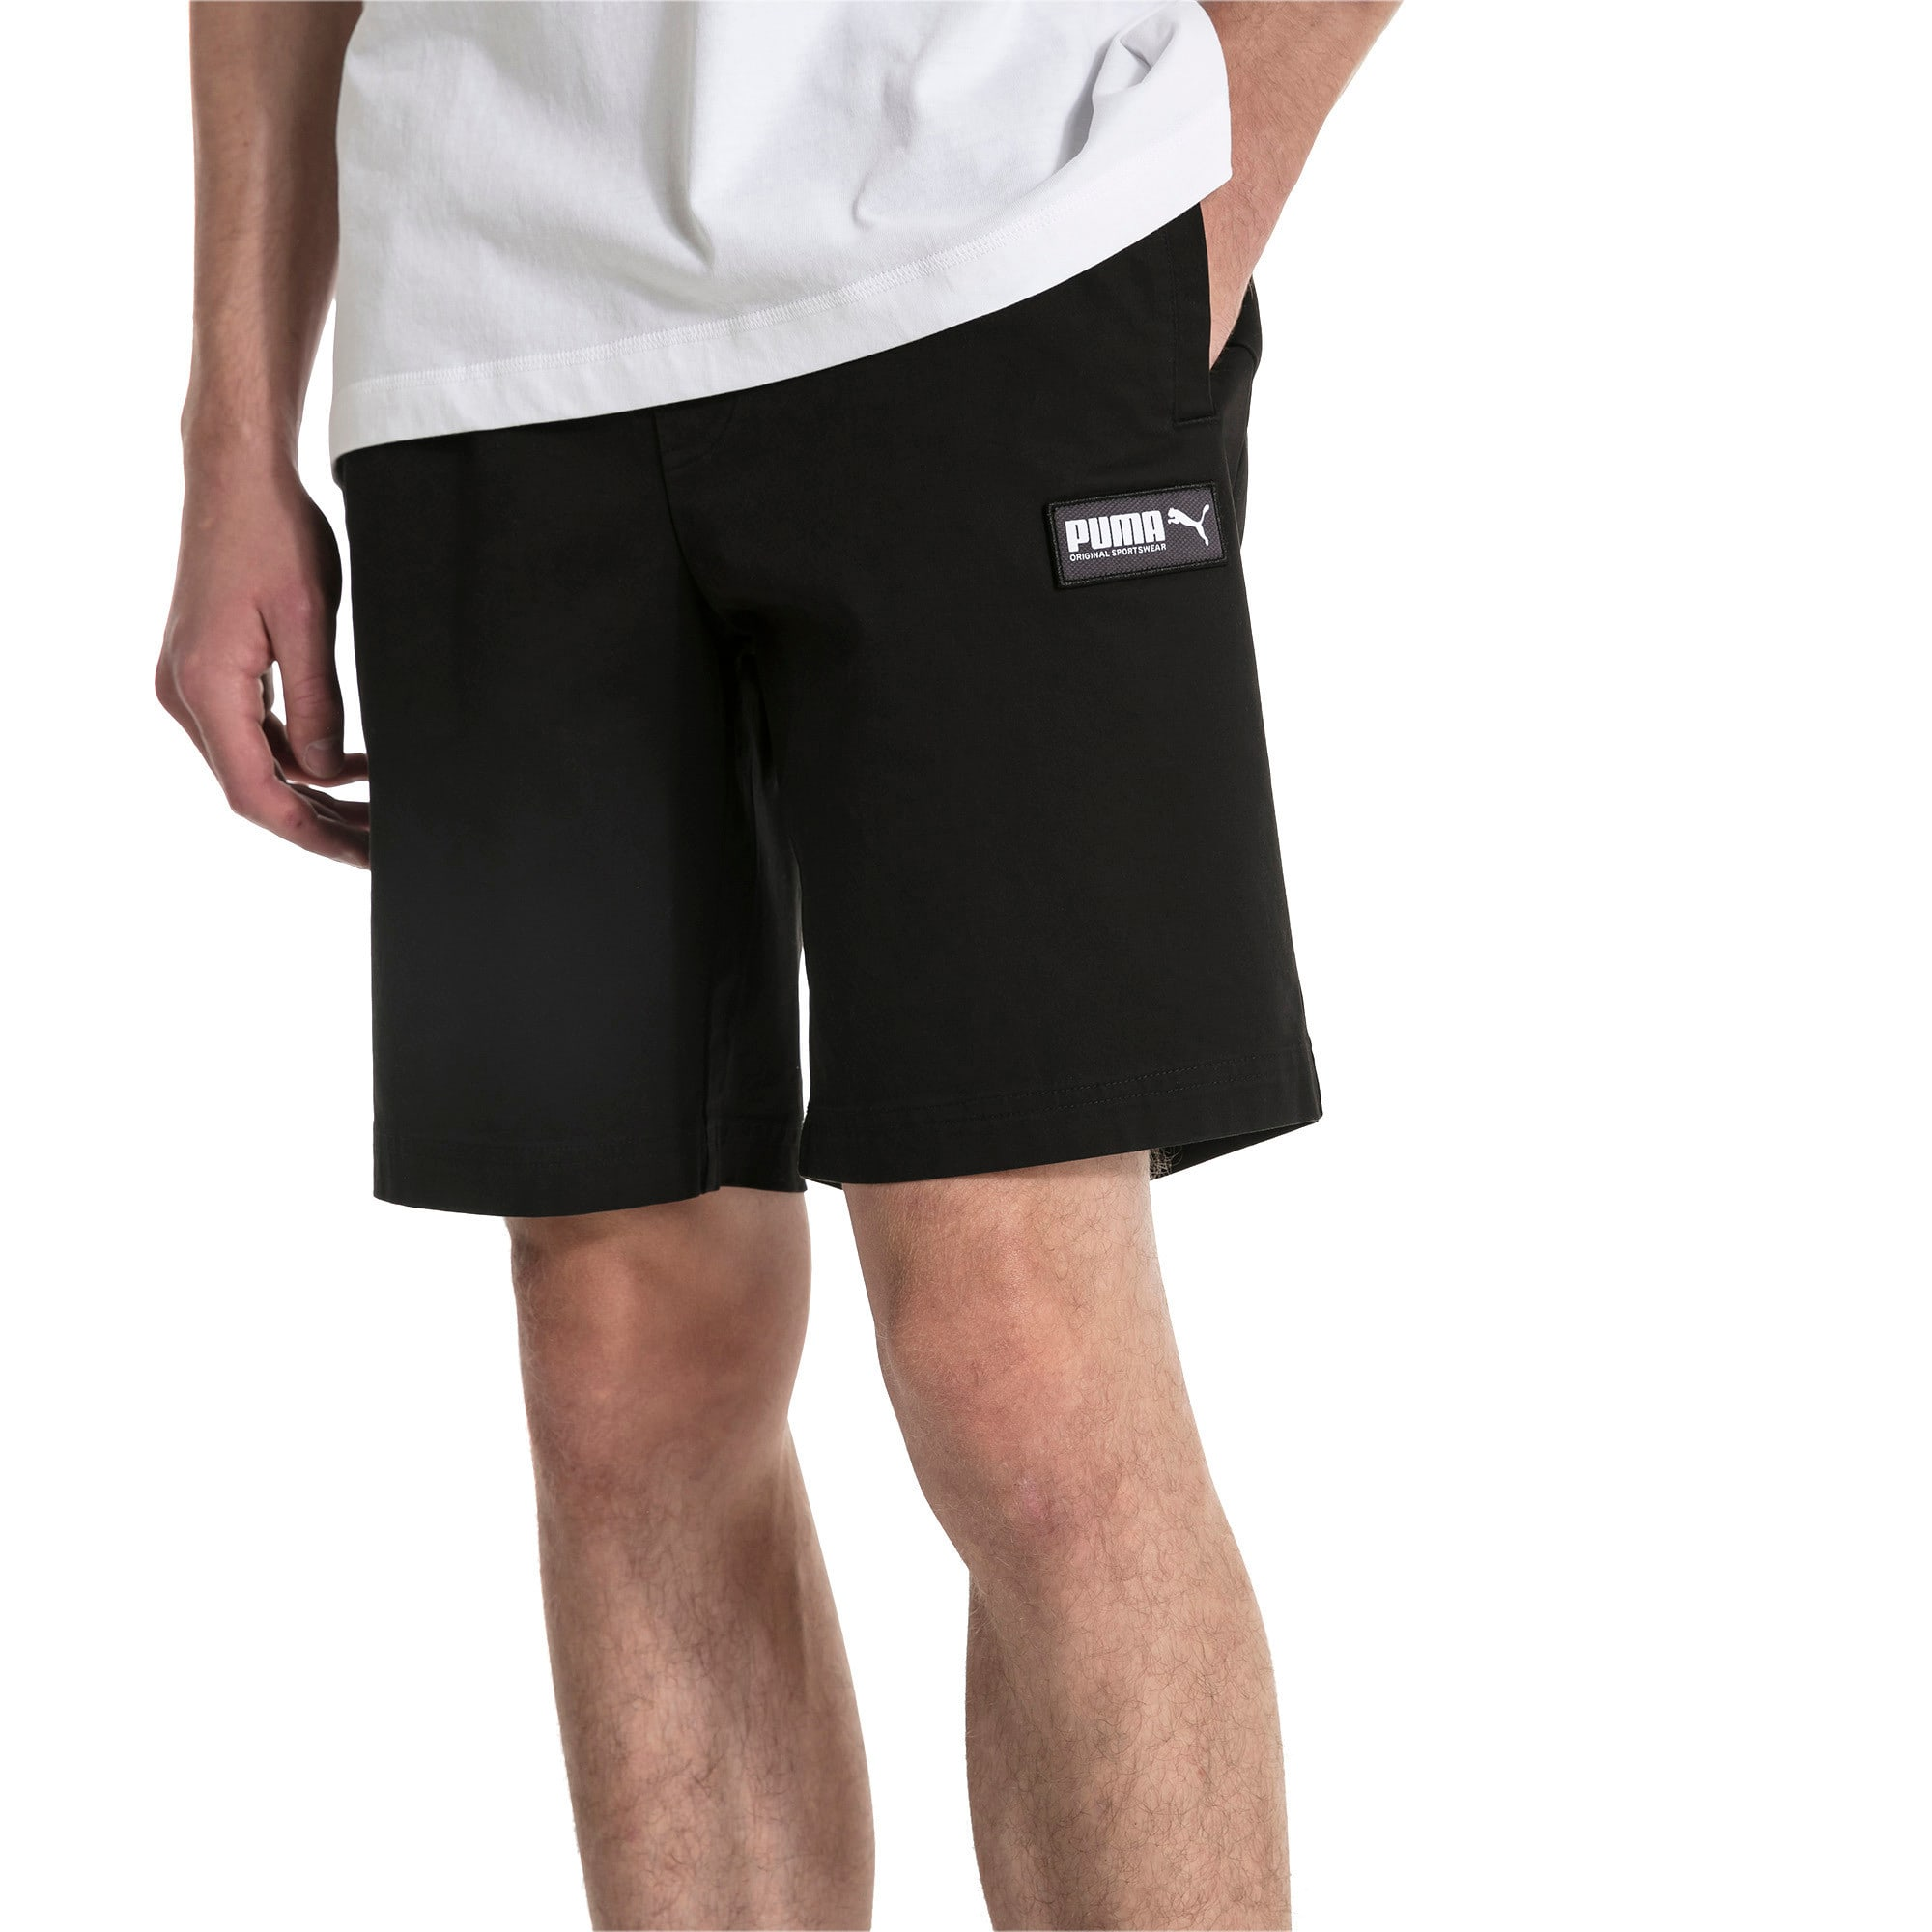 Thumbnail 1 of Fusion Men's Shorts, Puma Black, medium